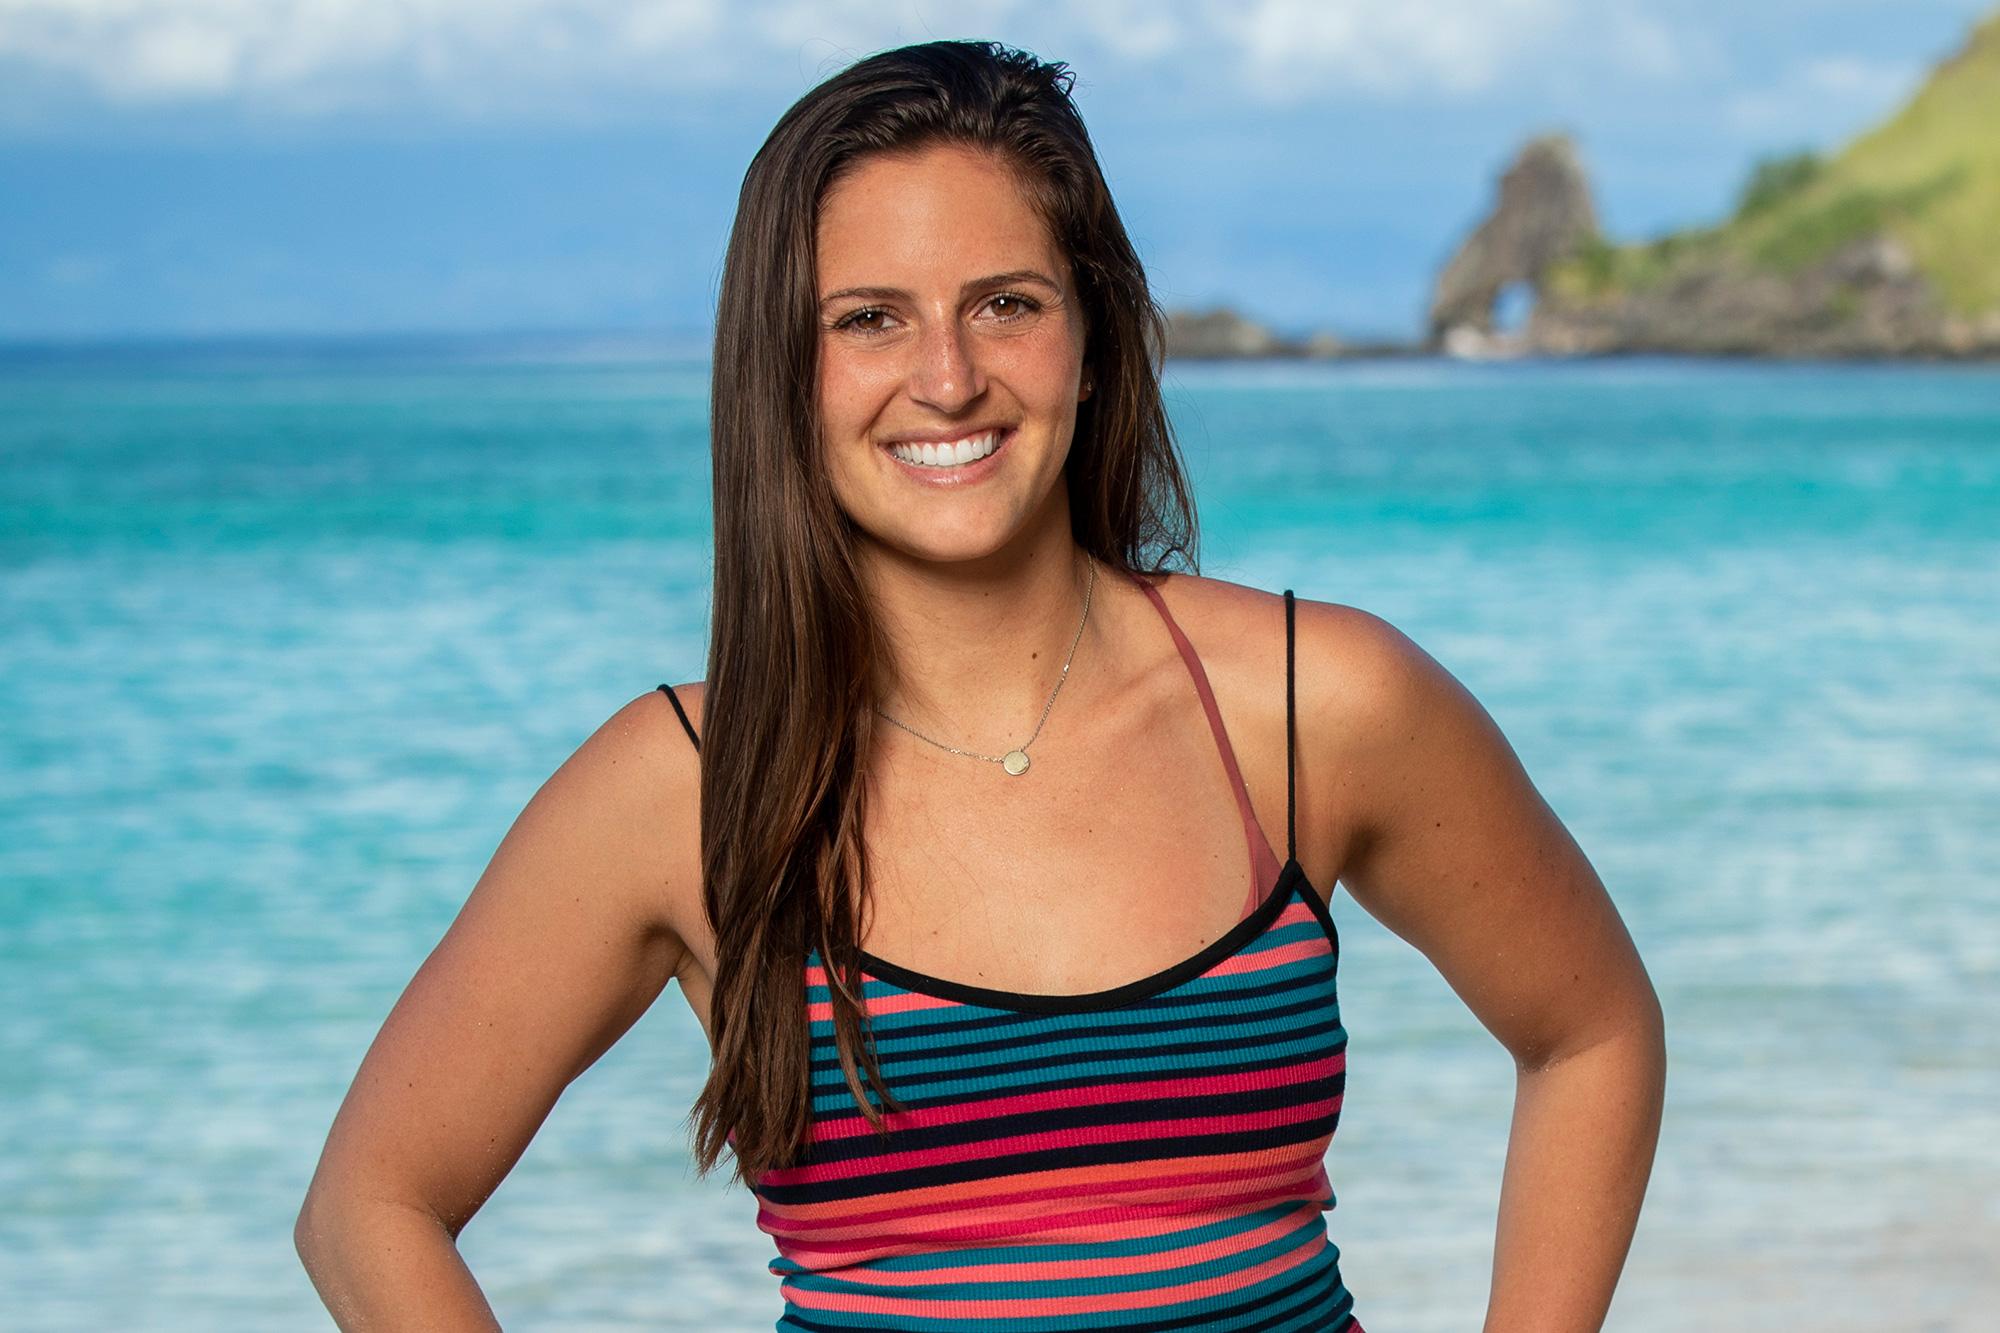 Chelsea Walker competes on SURVIVOR: Island of the Idols